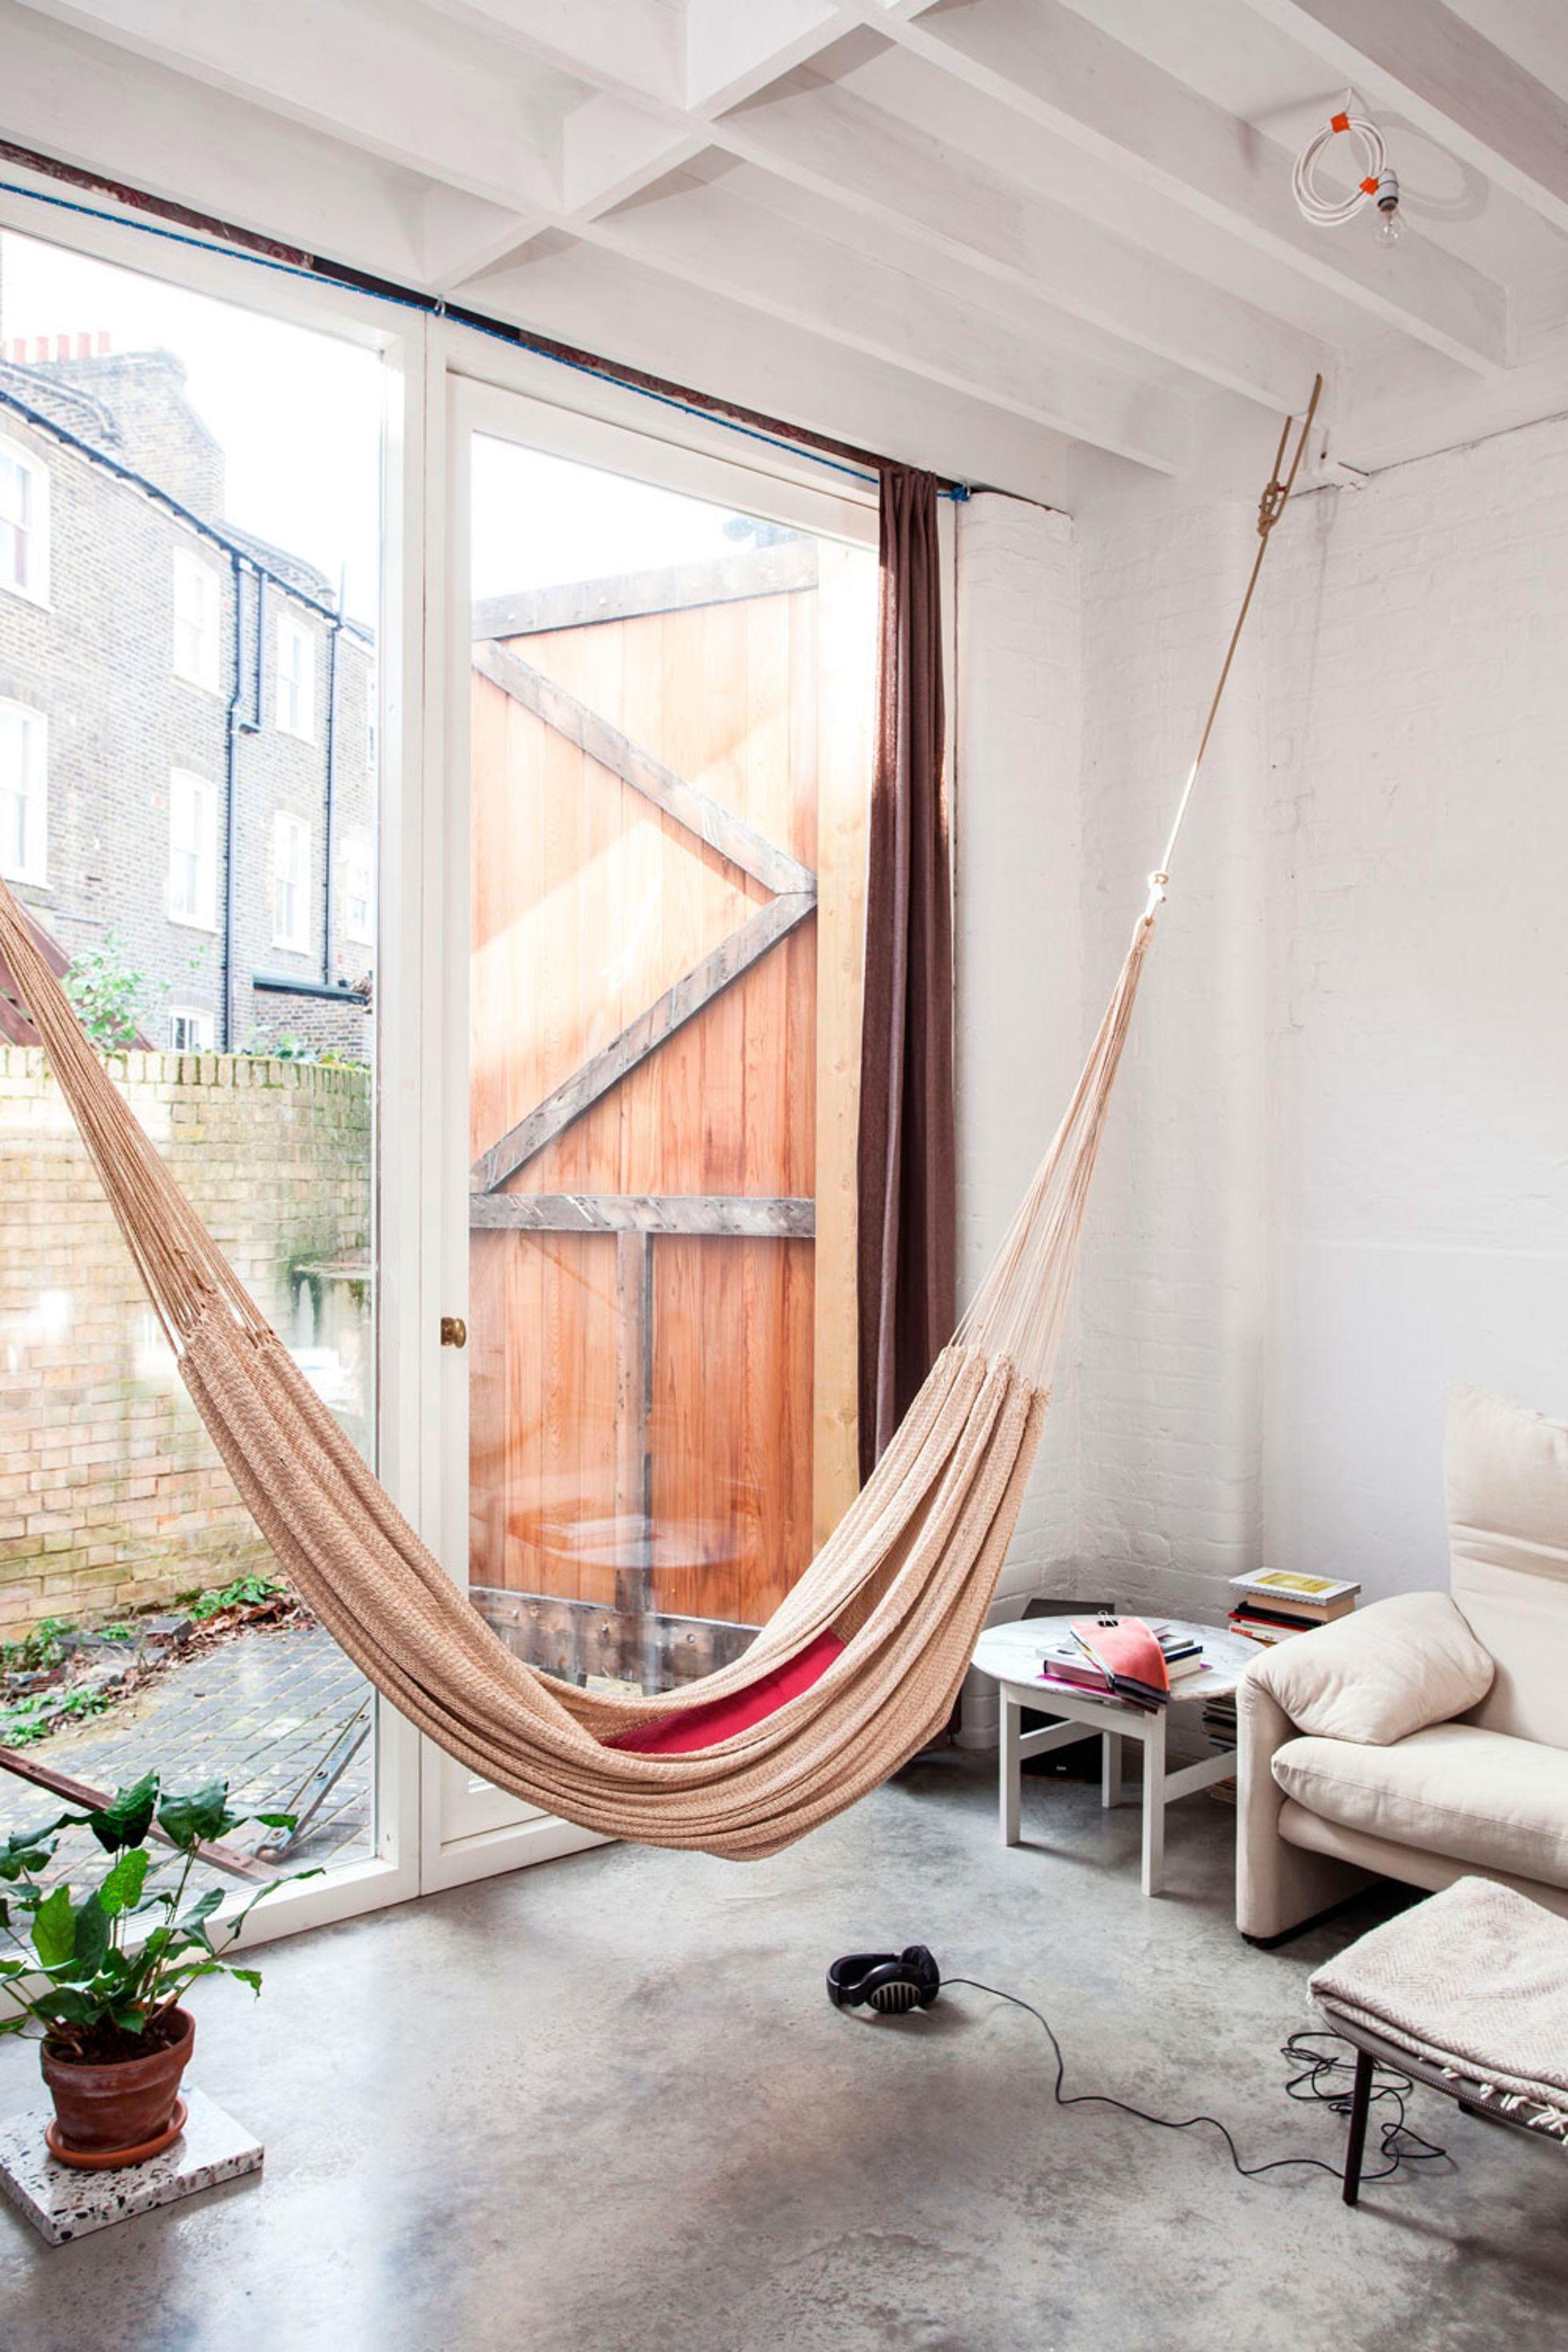 design shulman hammock architecture room living house associates